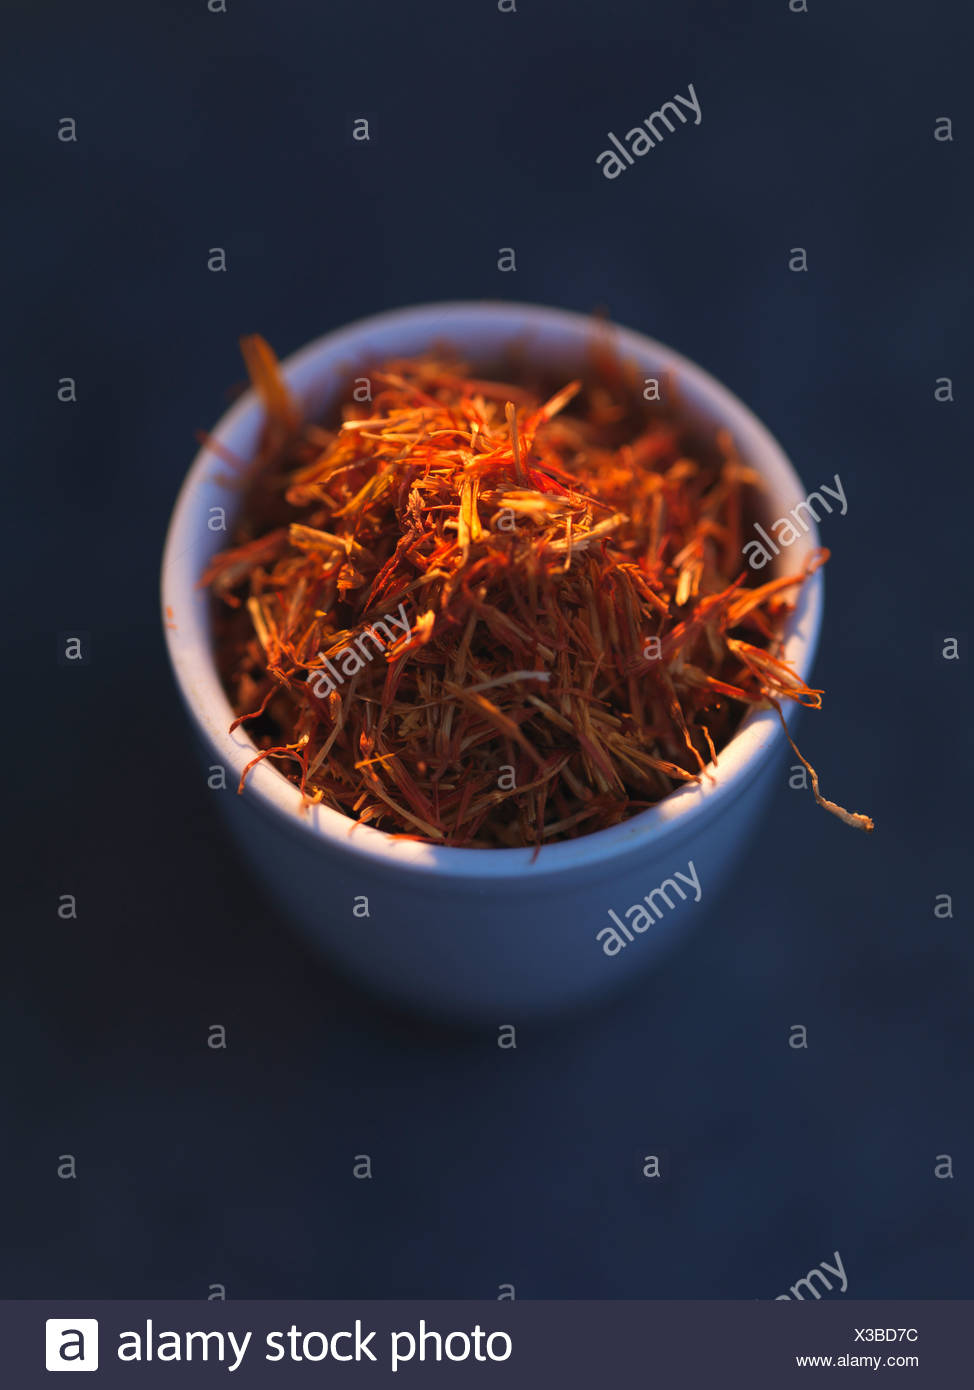 Saffron threads - Stock Image